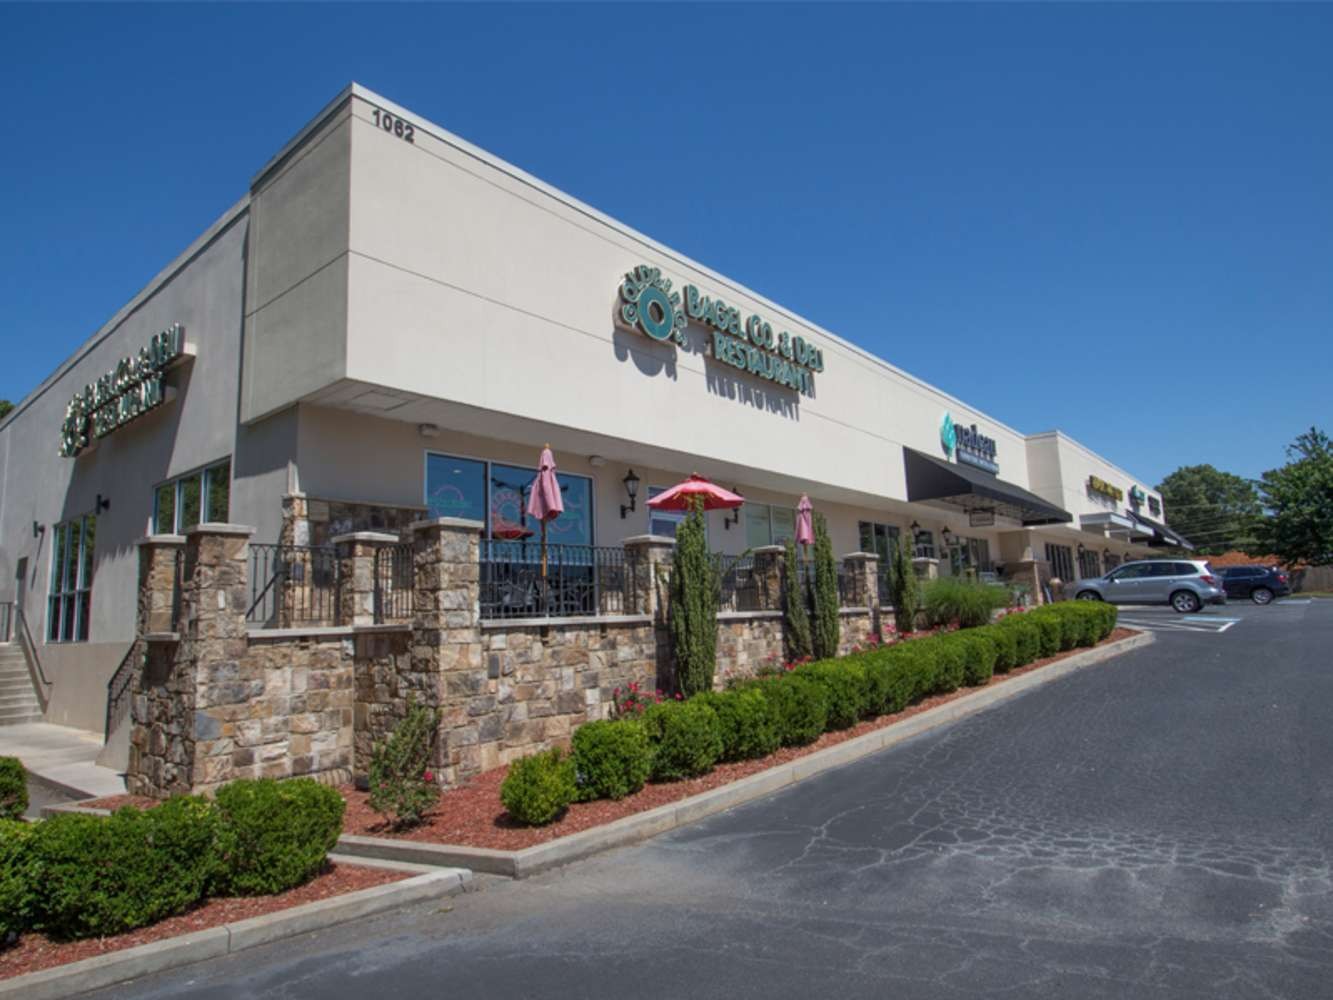 Retail Marietta, 30068-5522 - 1062 Johnson Ferry Rd